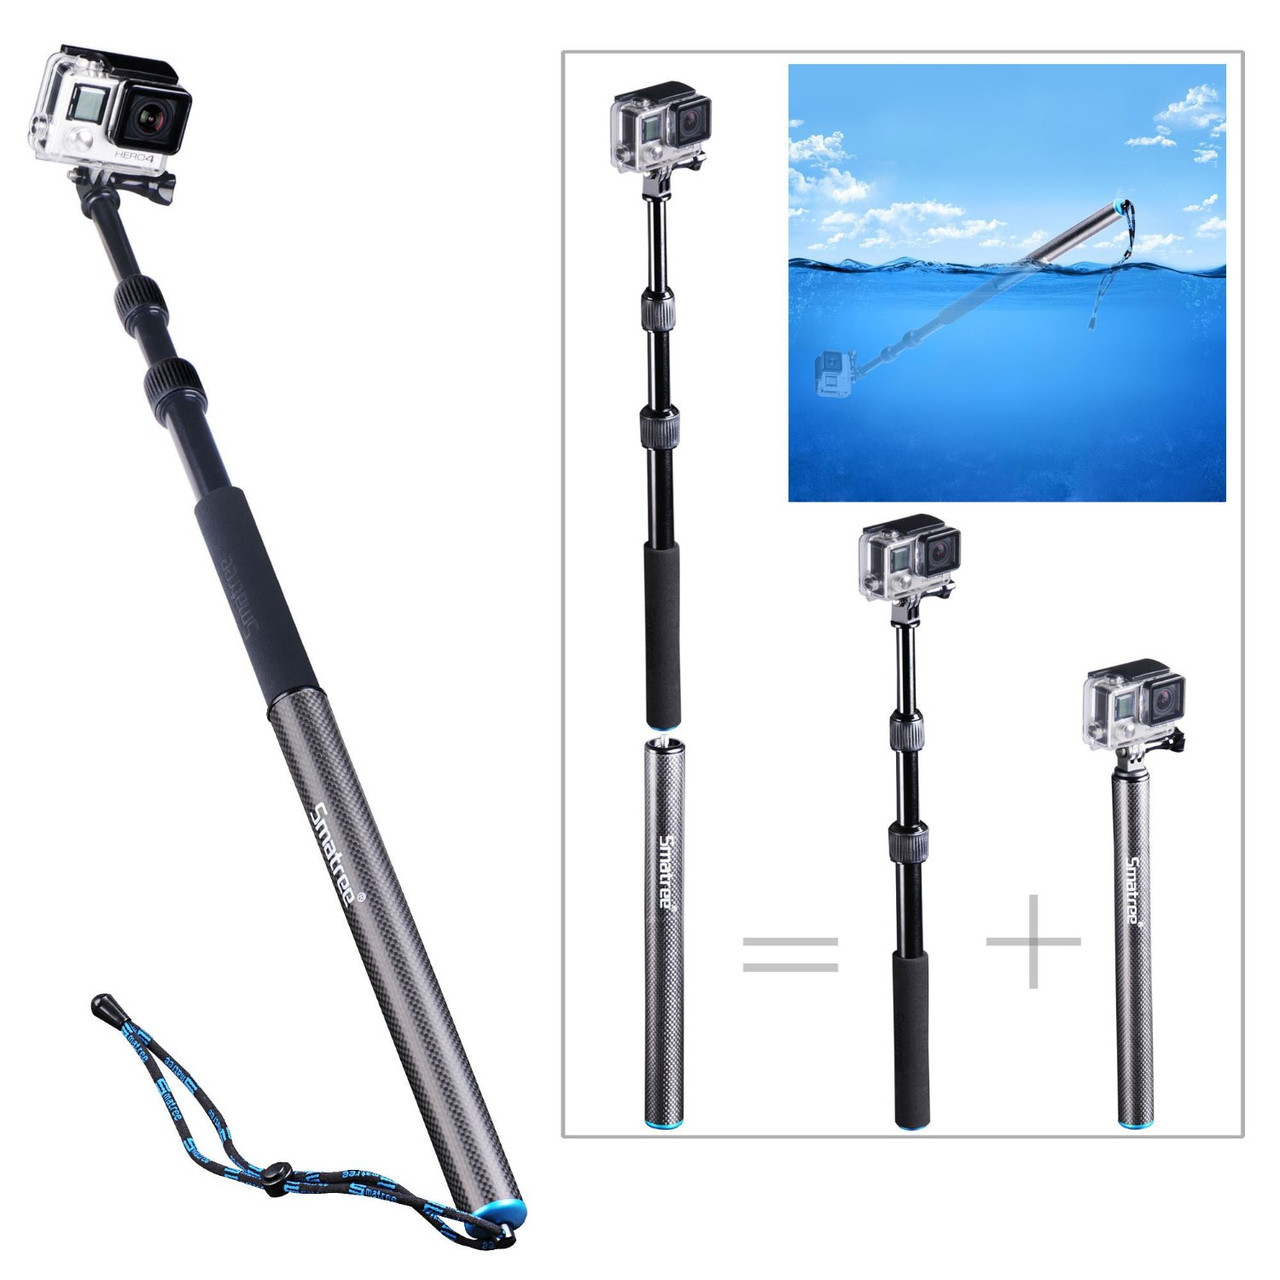 Smatree® SmaPole S3 монопод-поплавок для GoPro/SJ4000